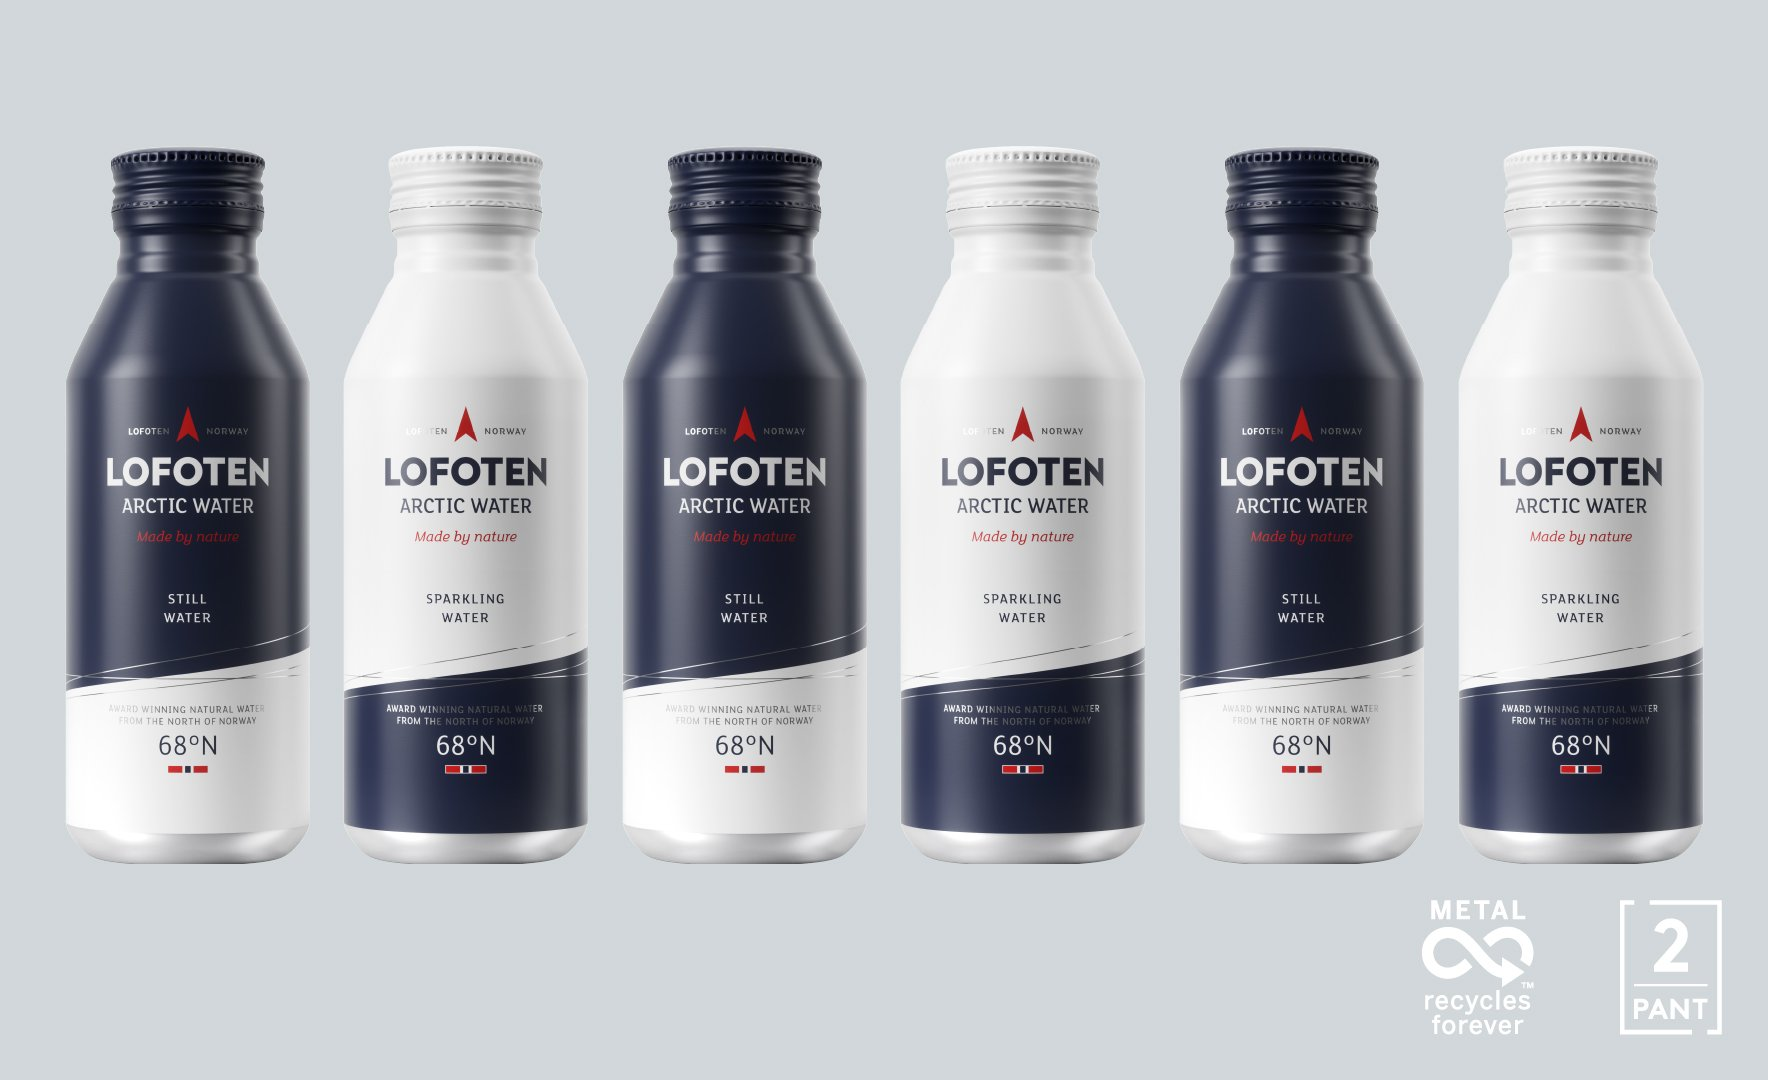 Lofoten Arctic Water aluminium bottles